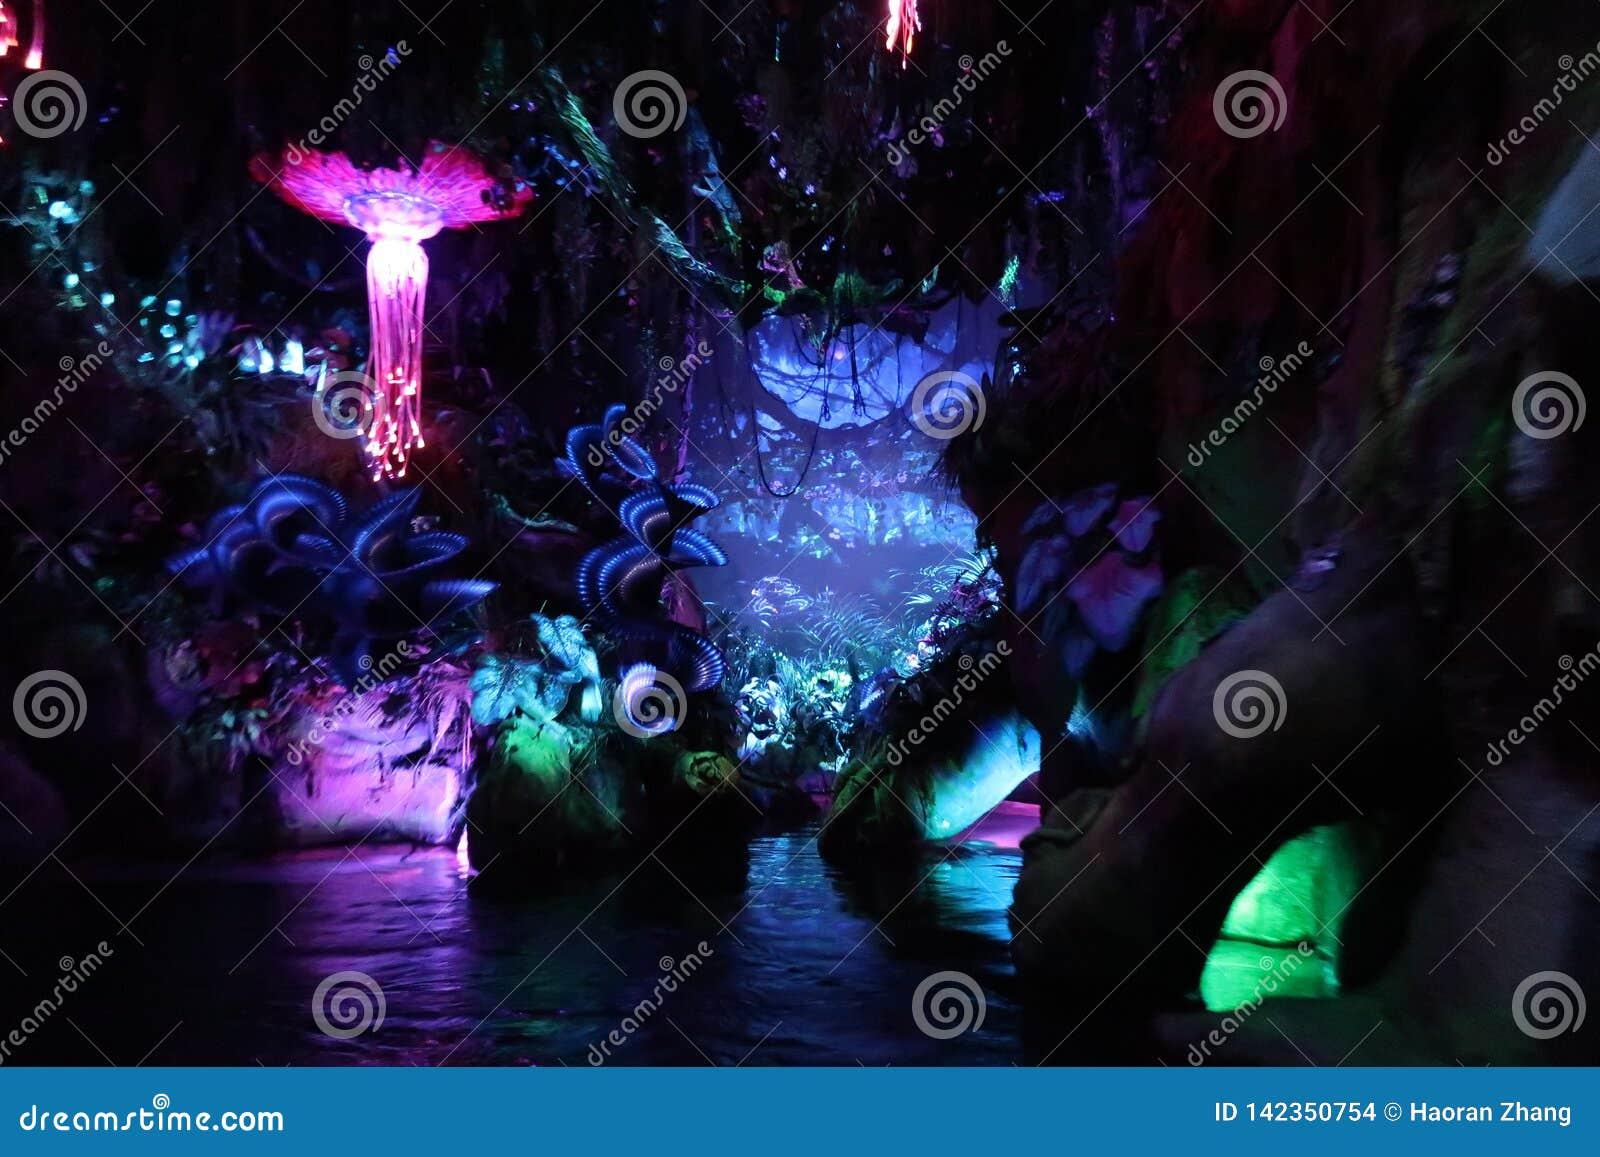 Pandora The World Of Avatar a Walt Disney